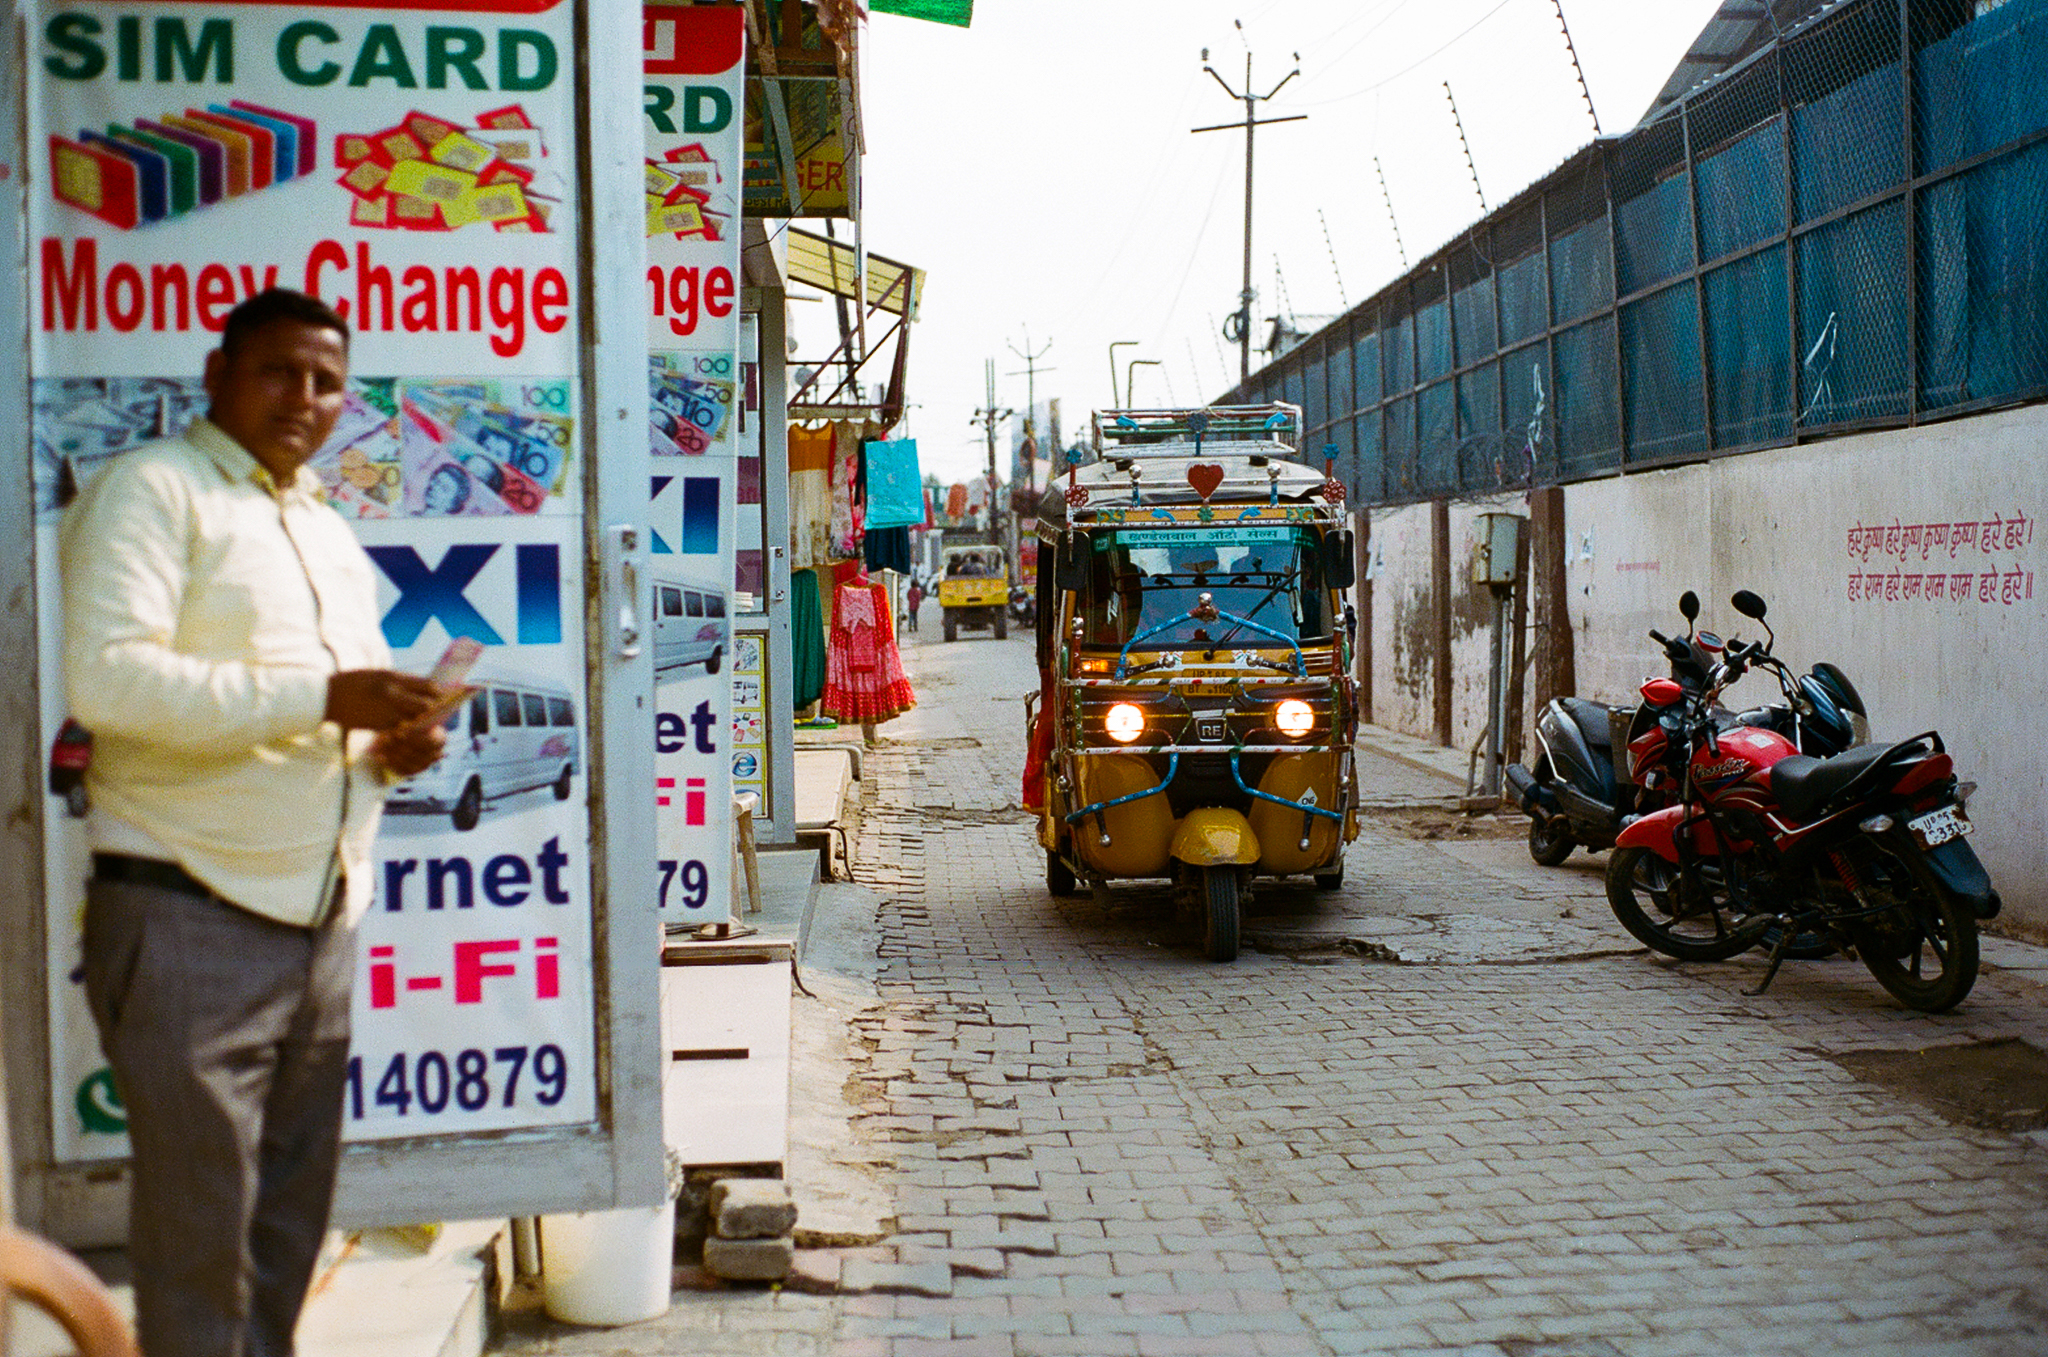 Vrindavan India Travel Street Photography (25 of 27).jpg